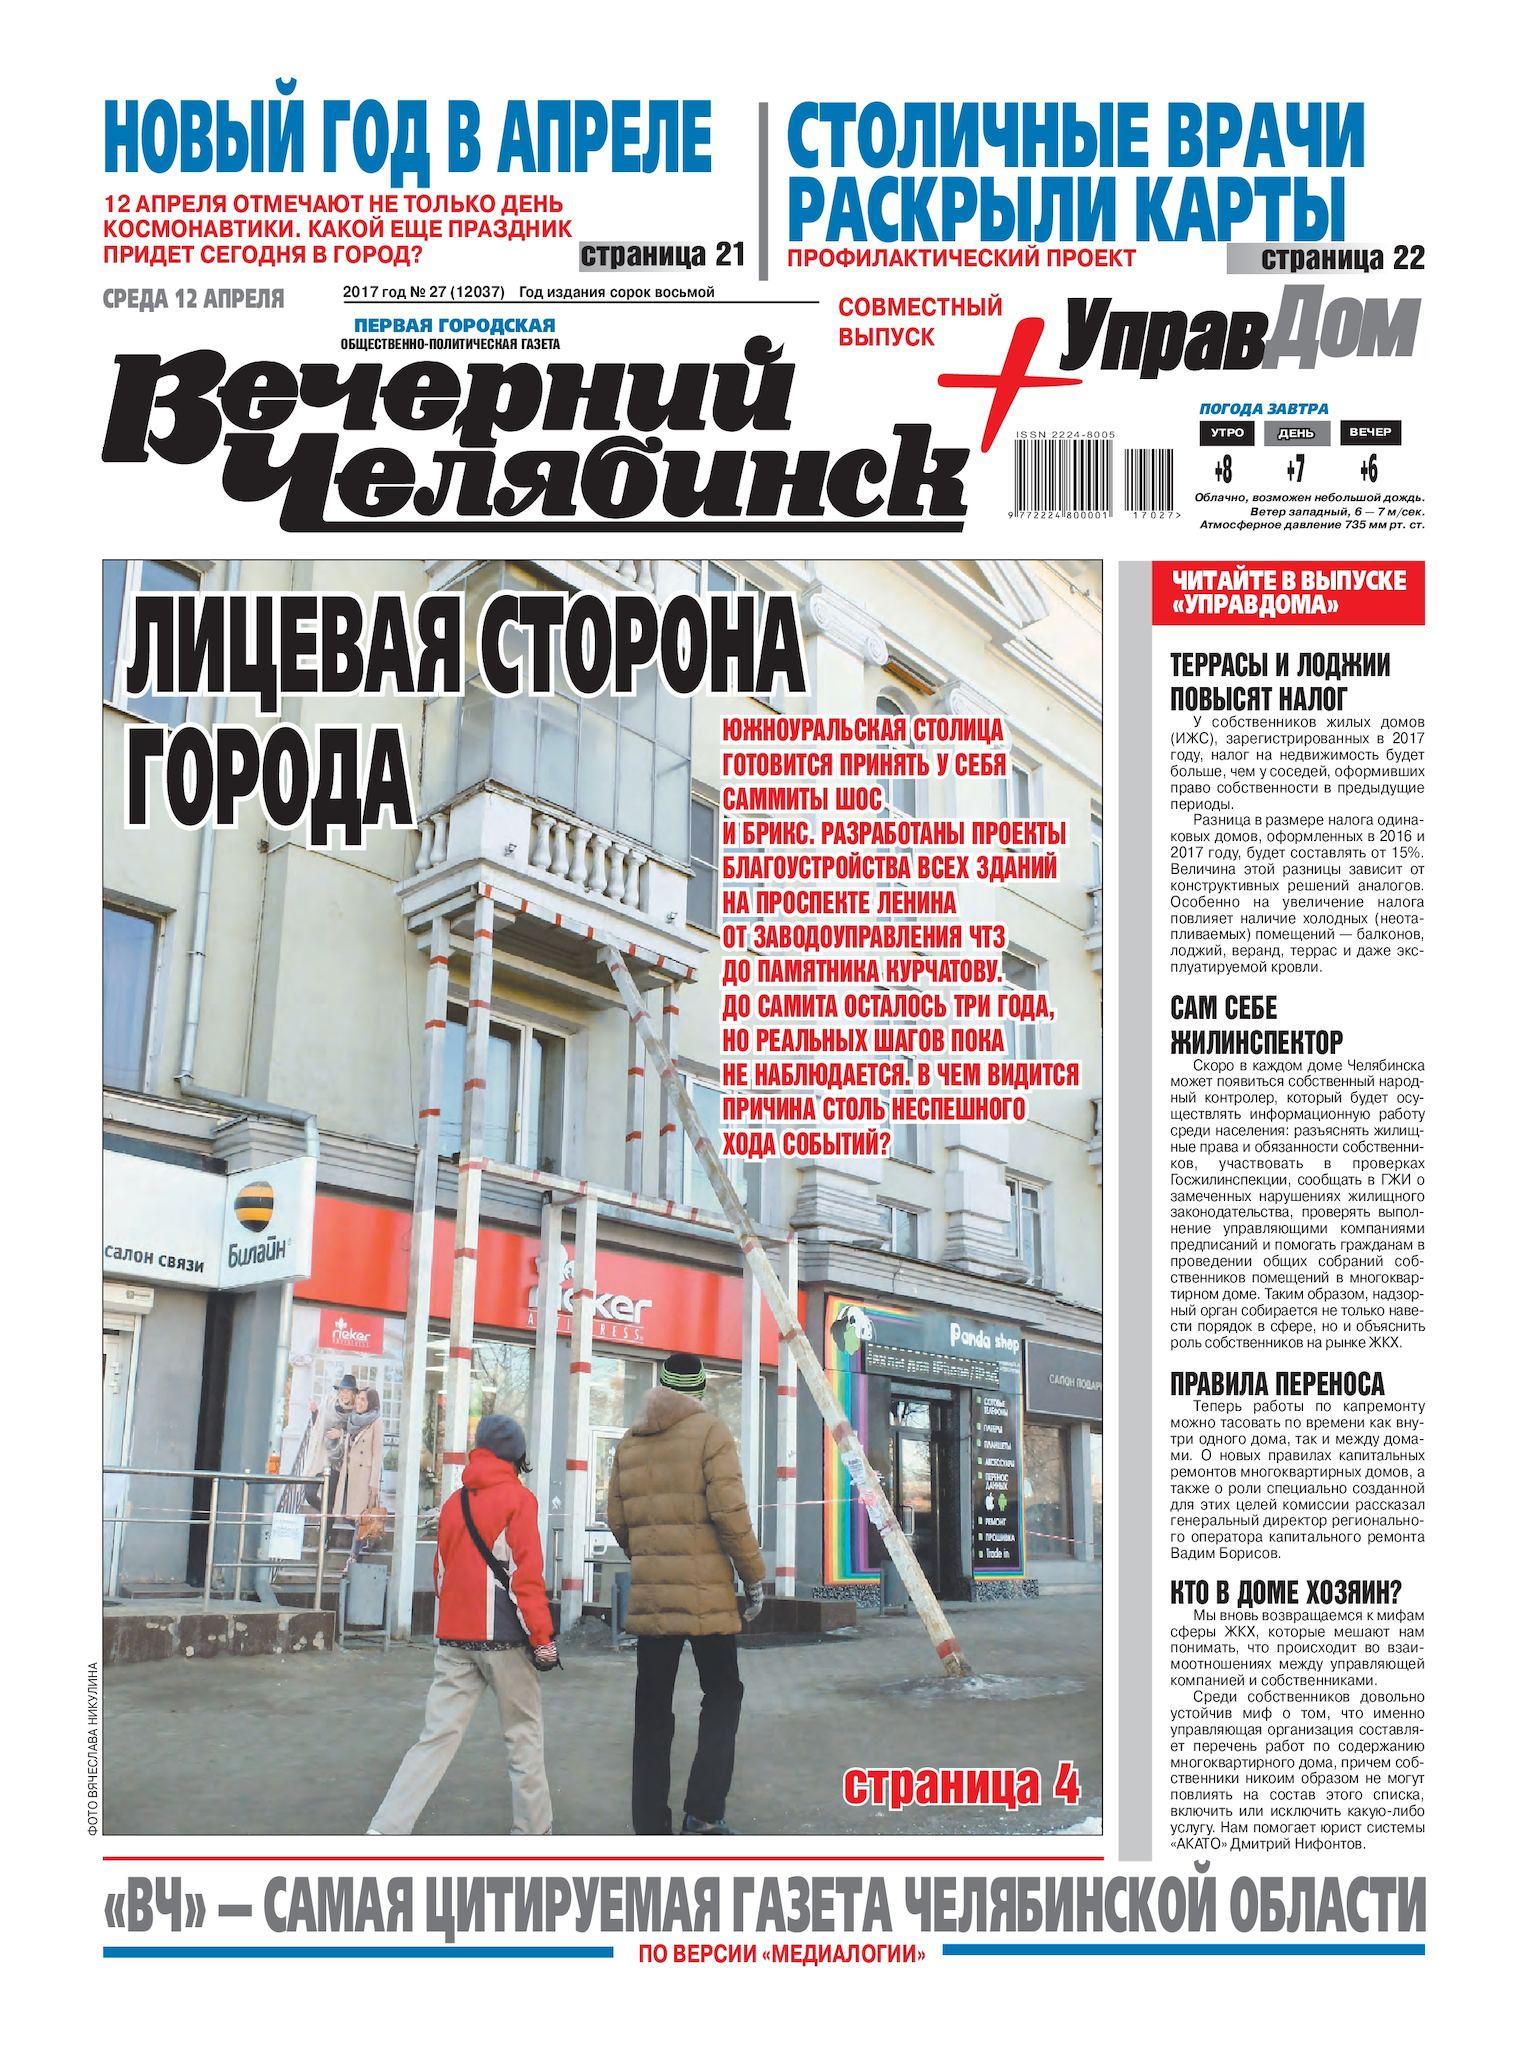 Тимофей взял в кредит 1.1 млн рублей